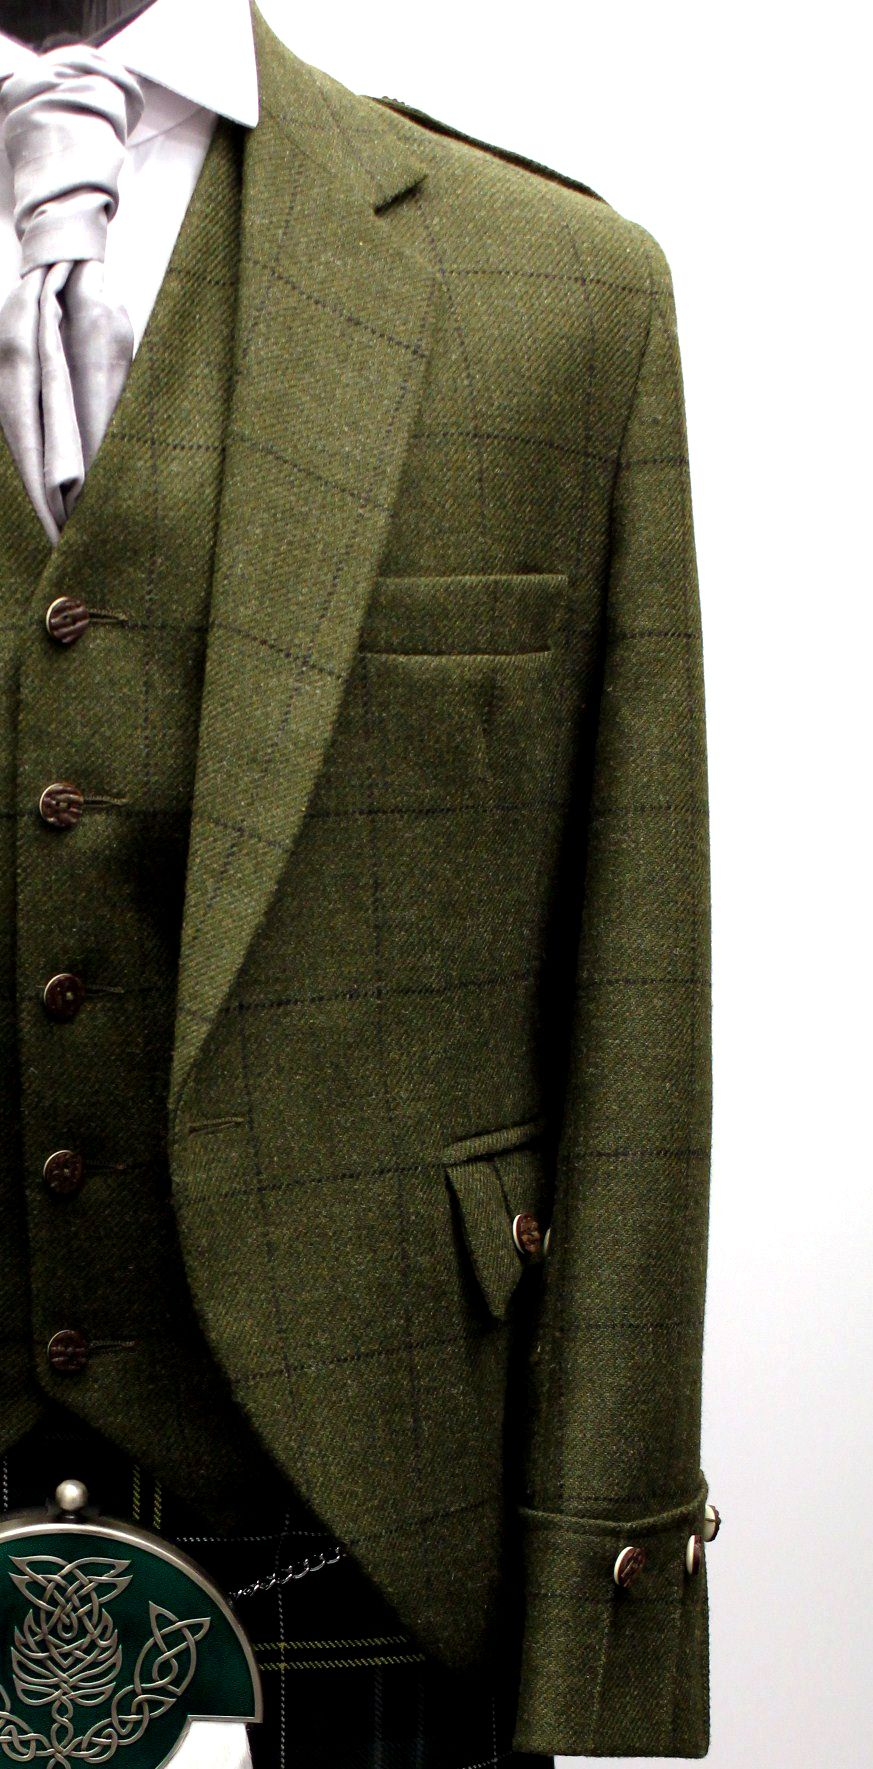 Green Tweed Argyll Kilt Jacket & Vest Tweed wedding